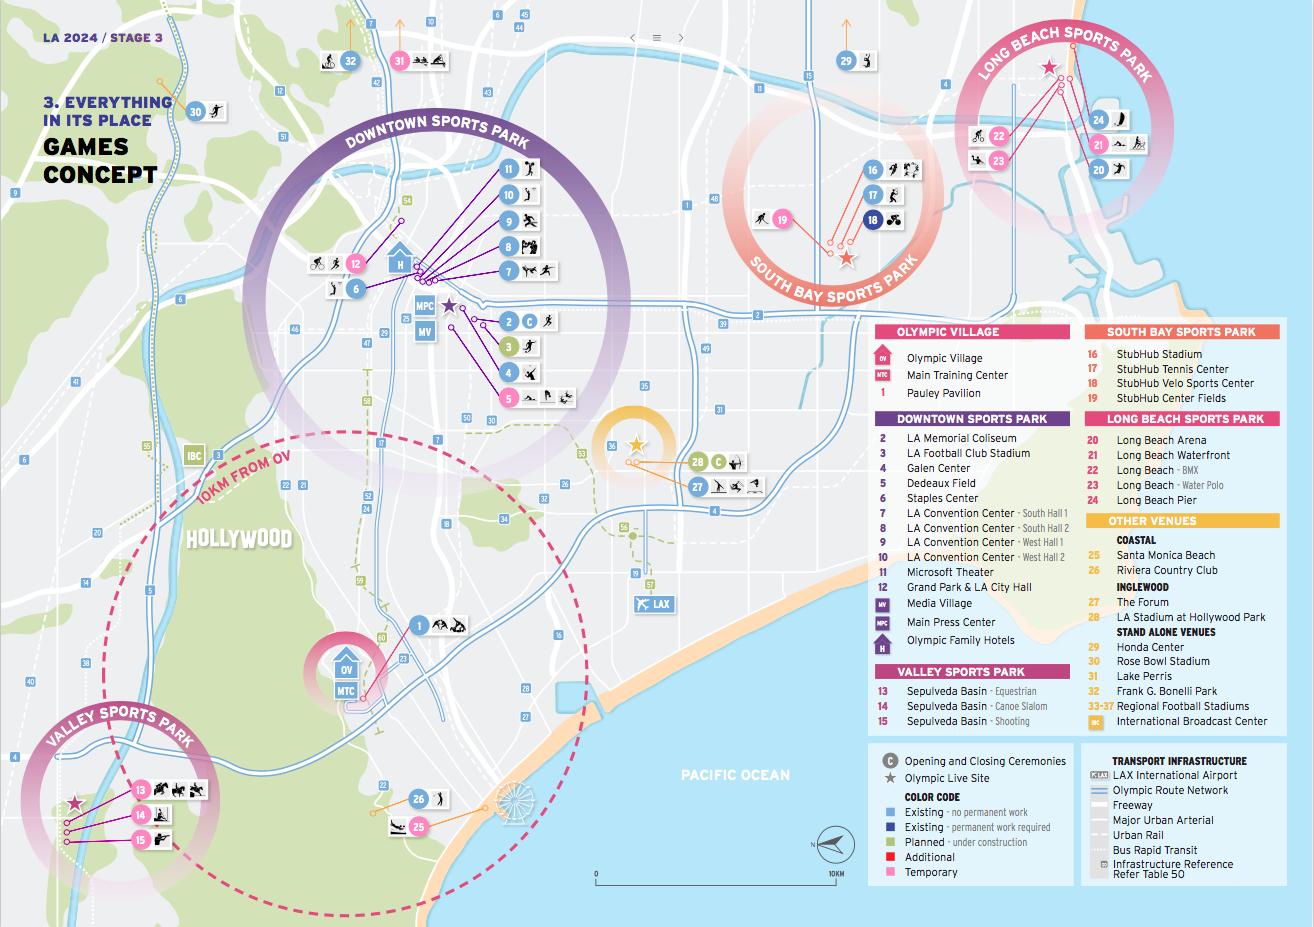 LA 2024 Olympic and Paralympic Bid Process - Venue Map